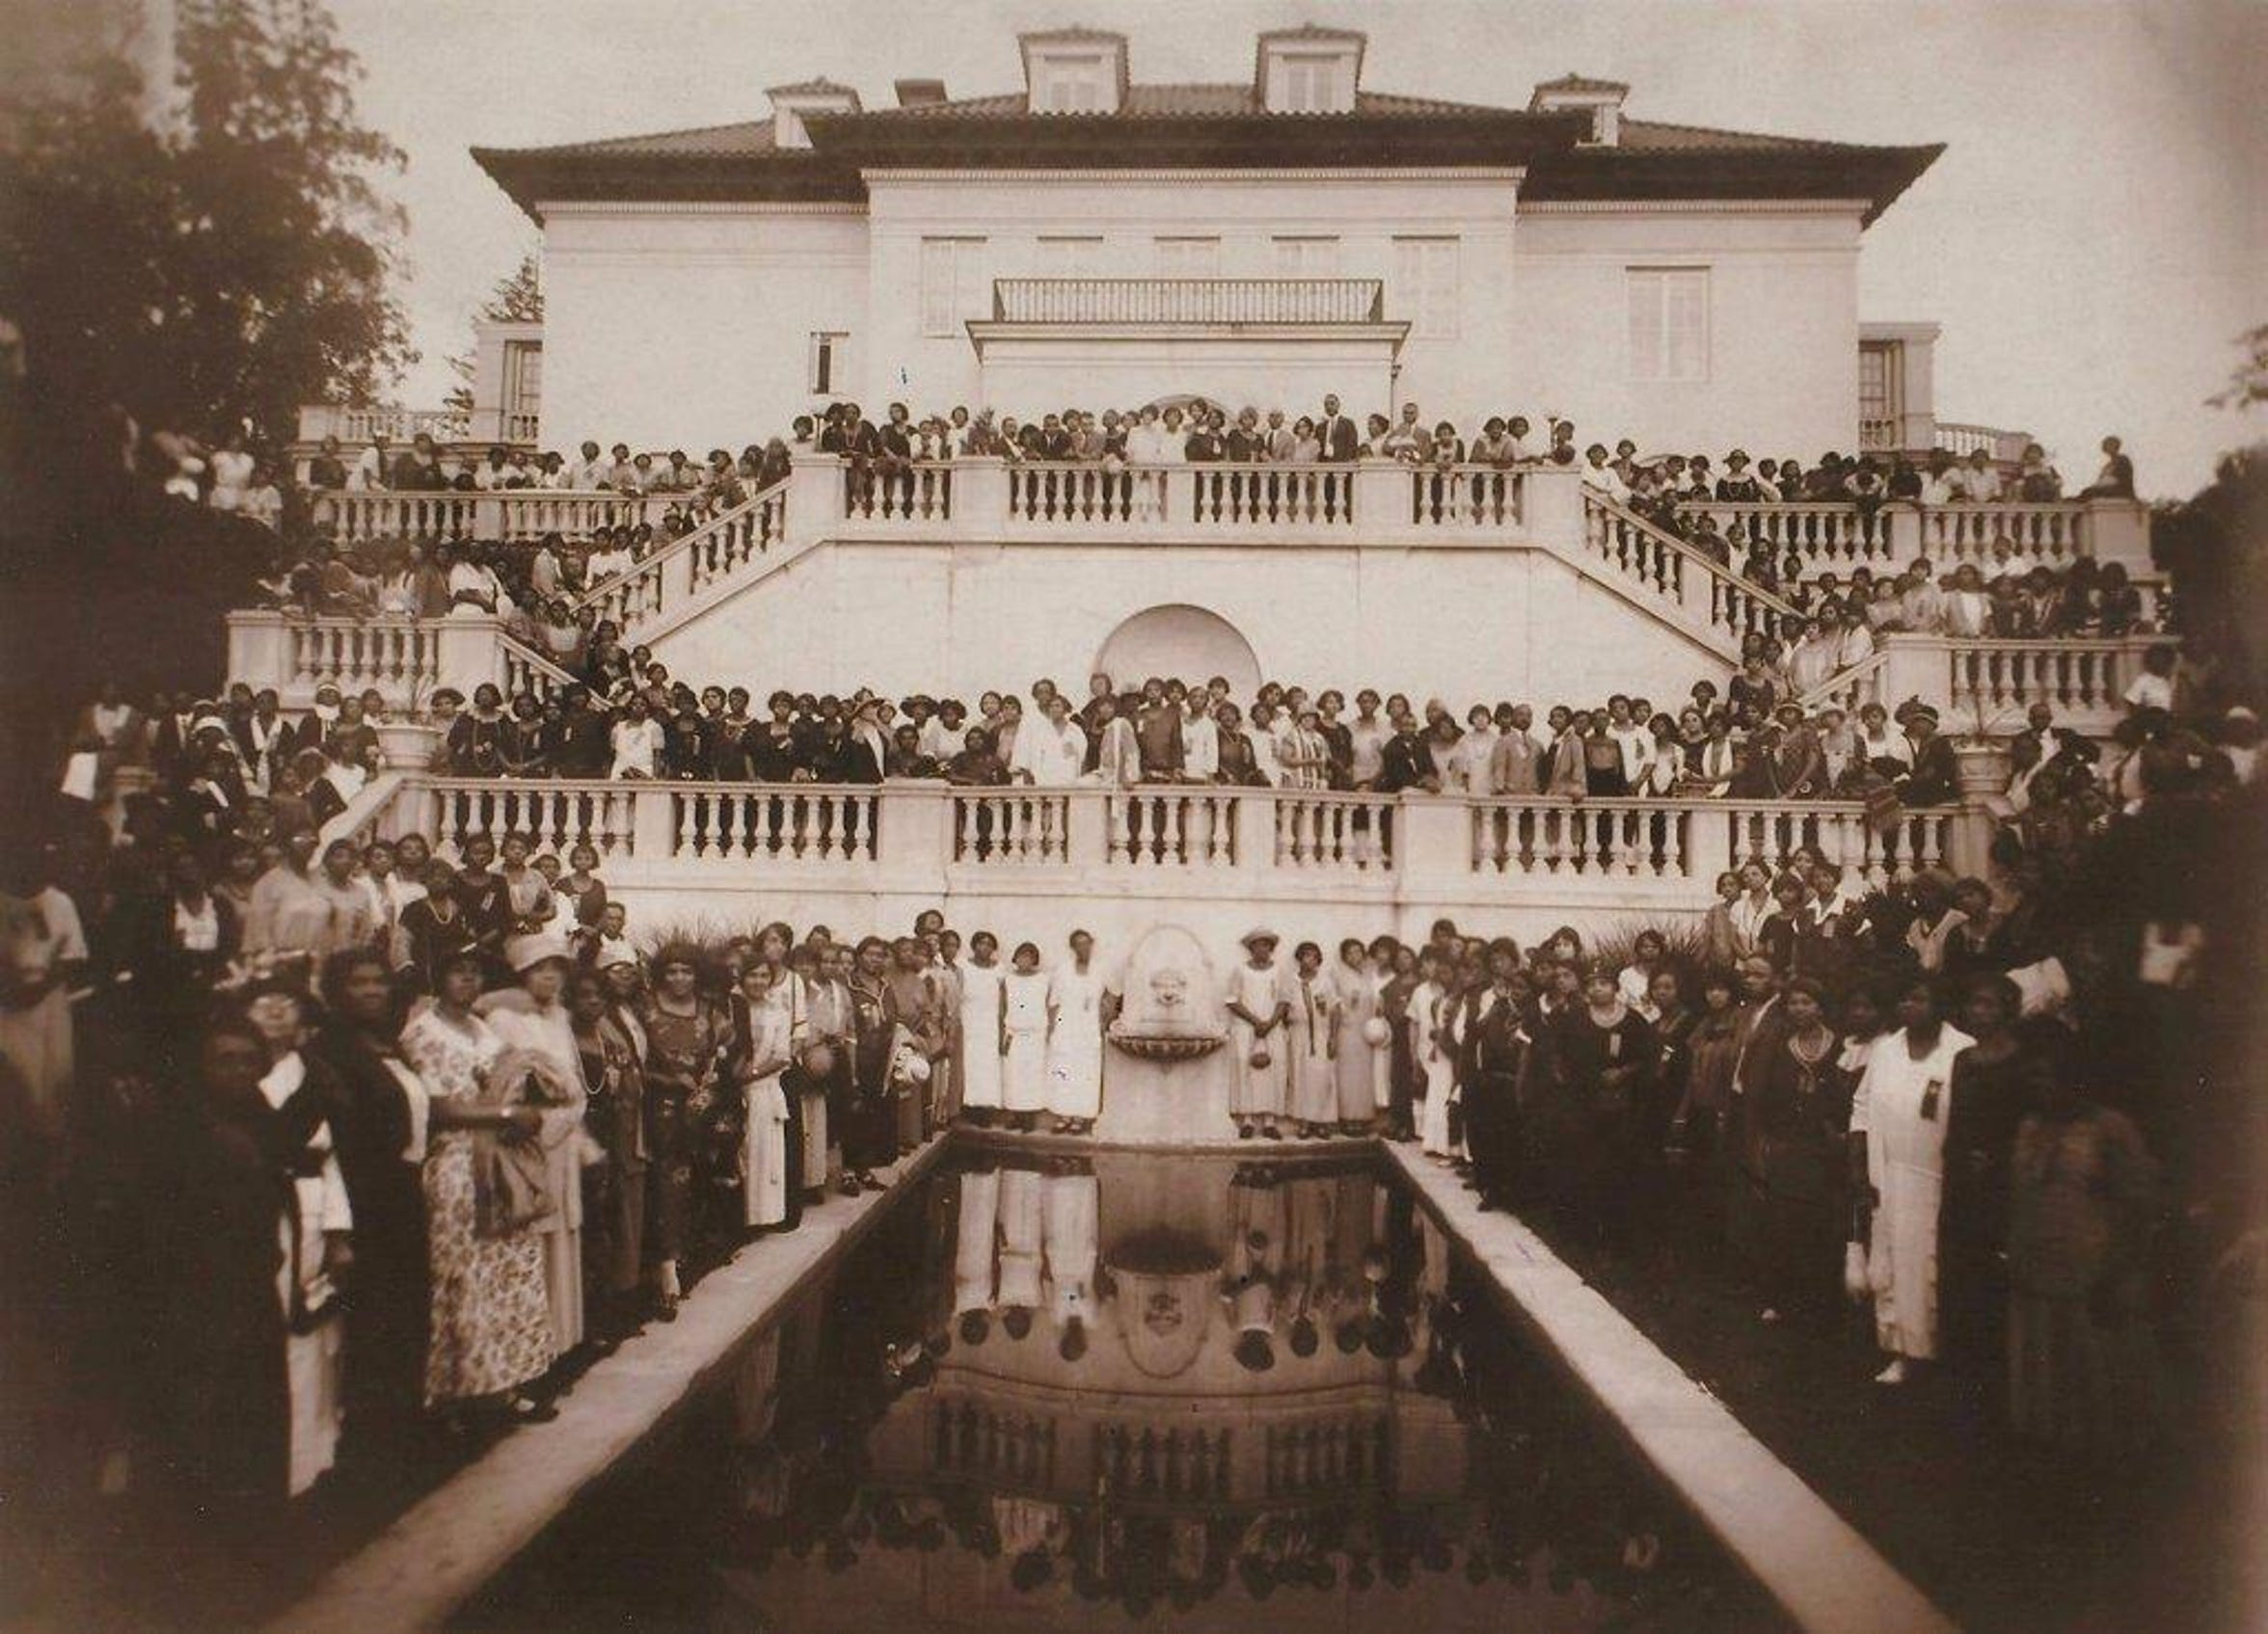 1924 Walker Beauty Culturists Convention at Villa Lewaro